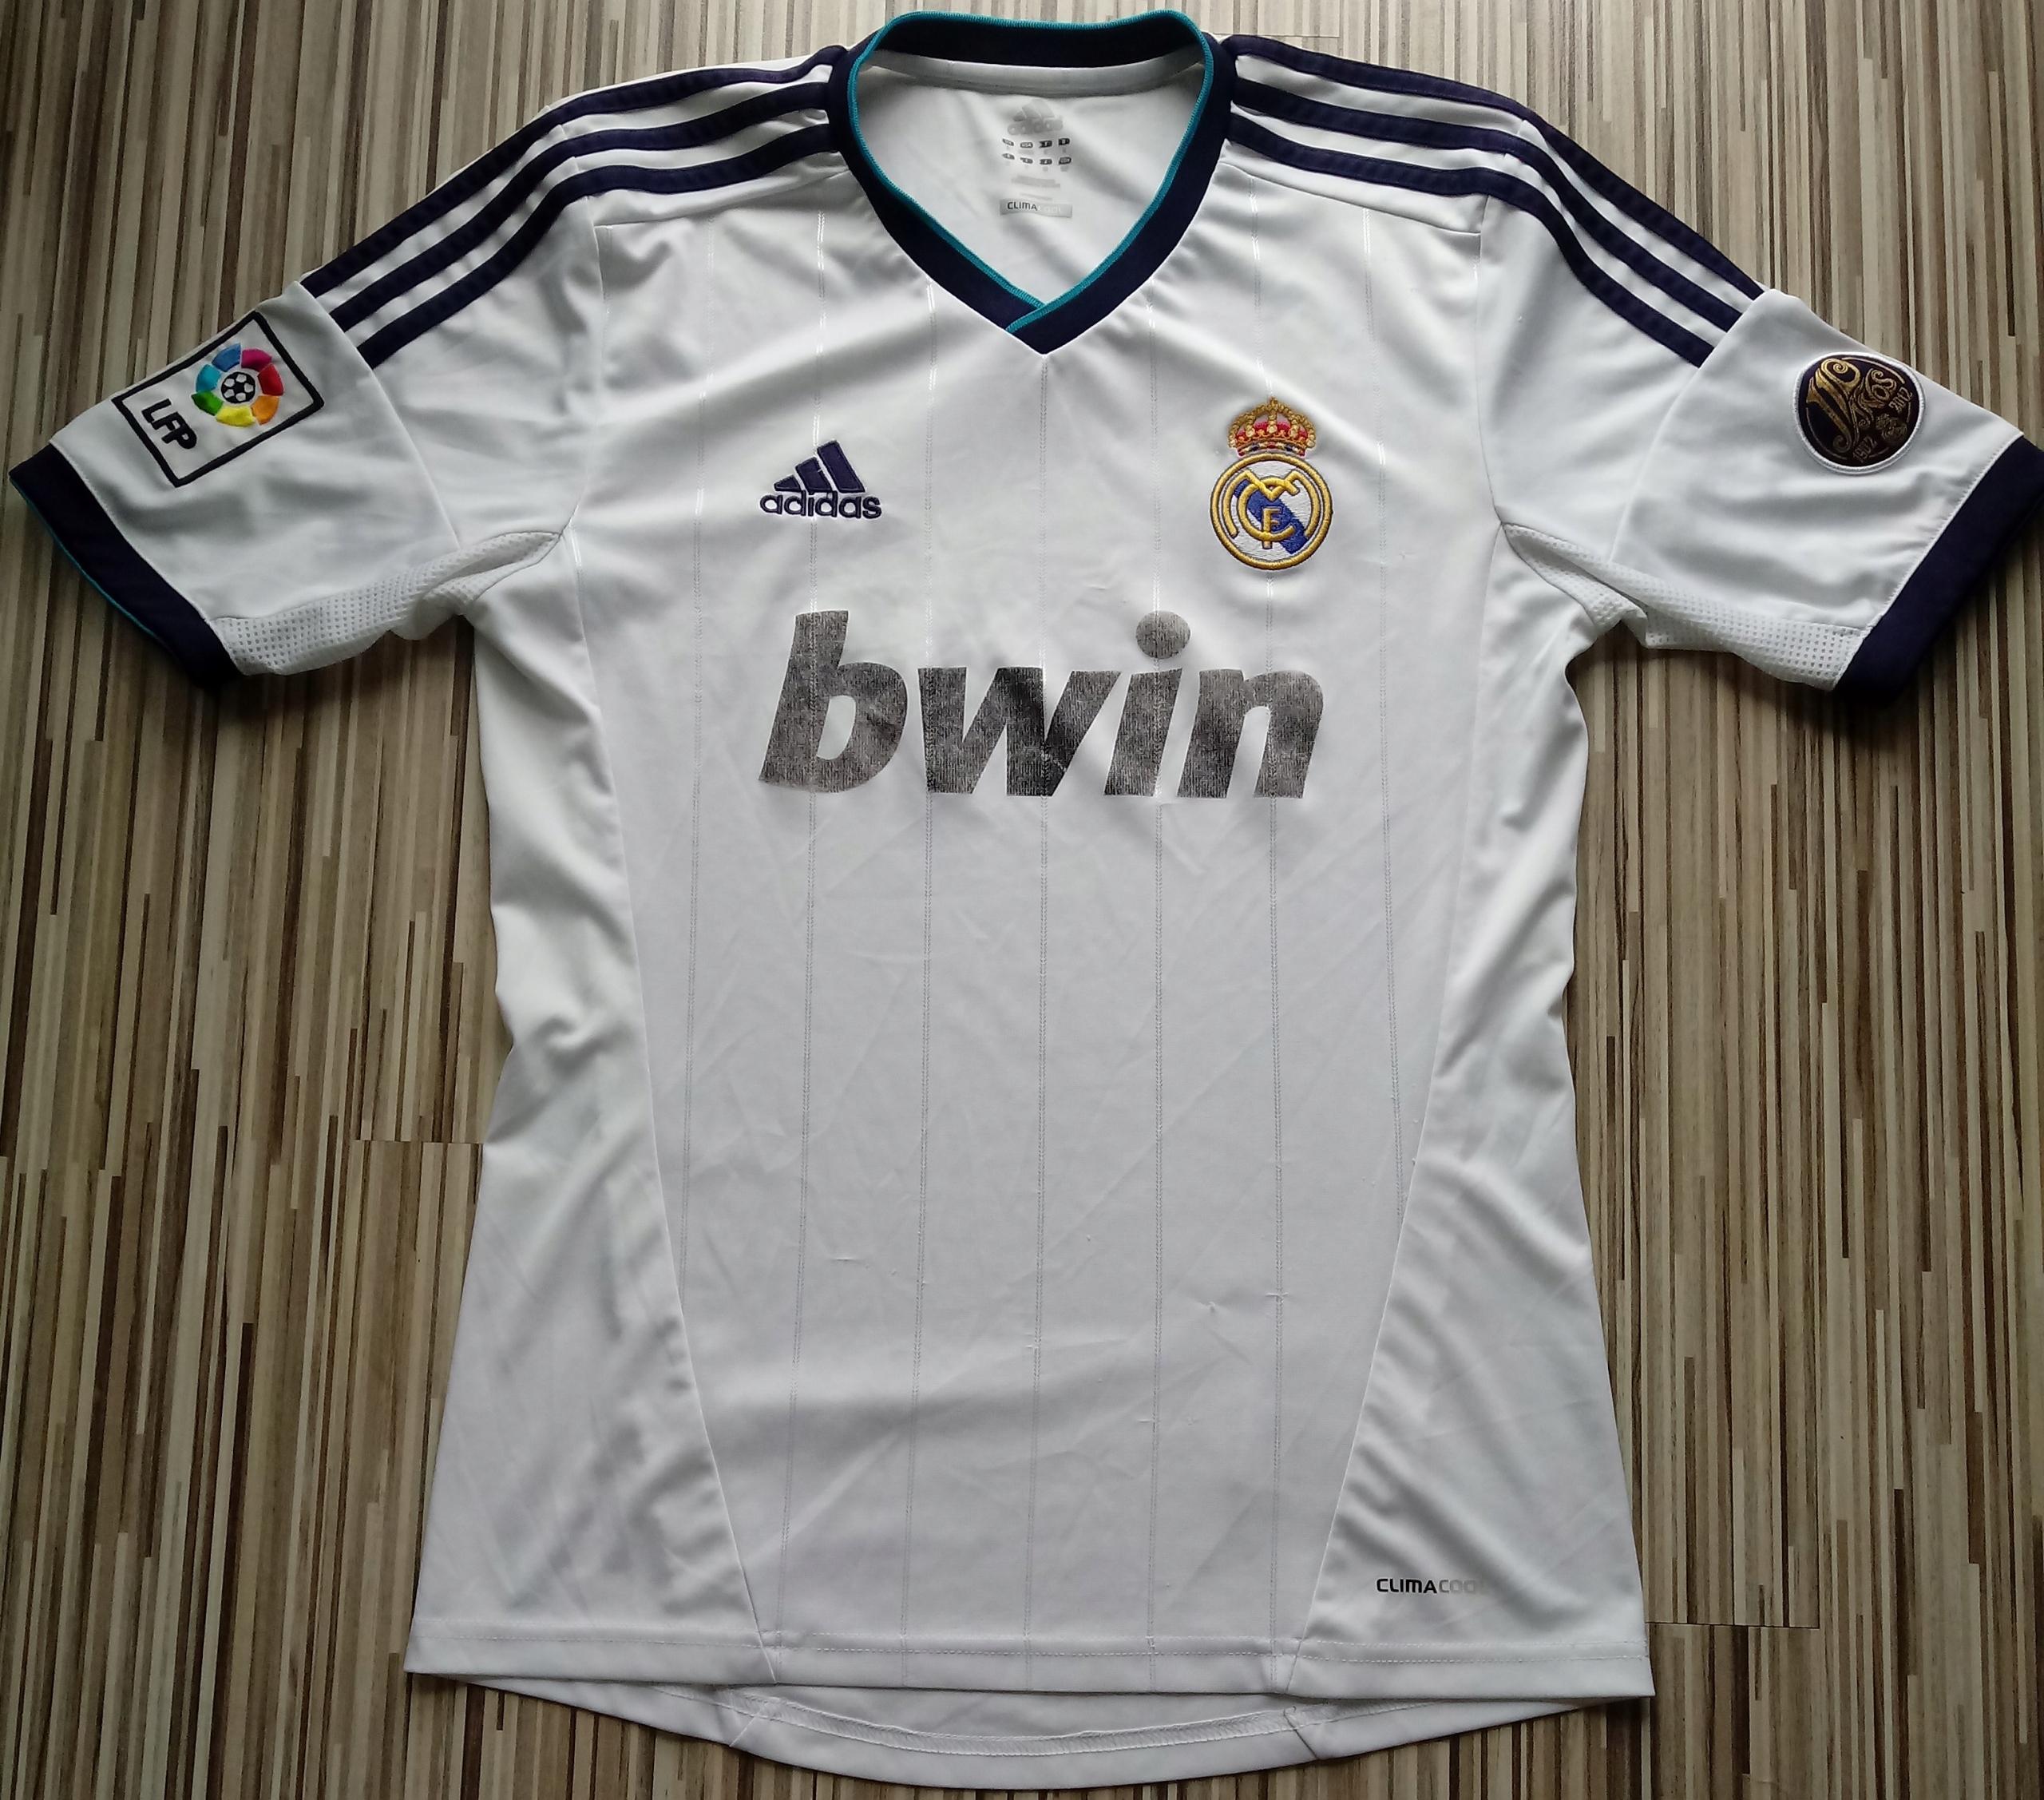 Koszulka Adidas Real Madryt sezon 12/13 S